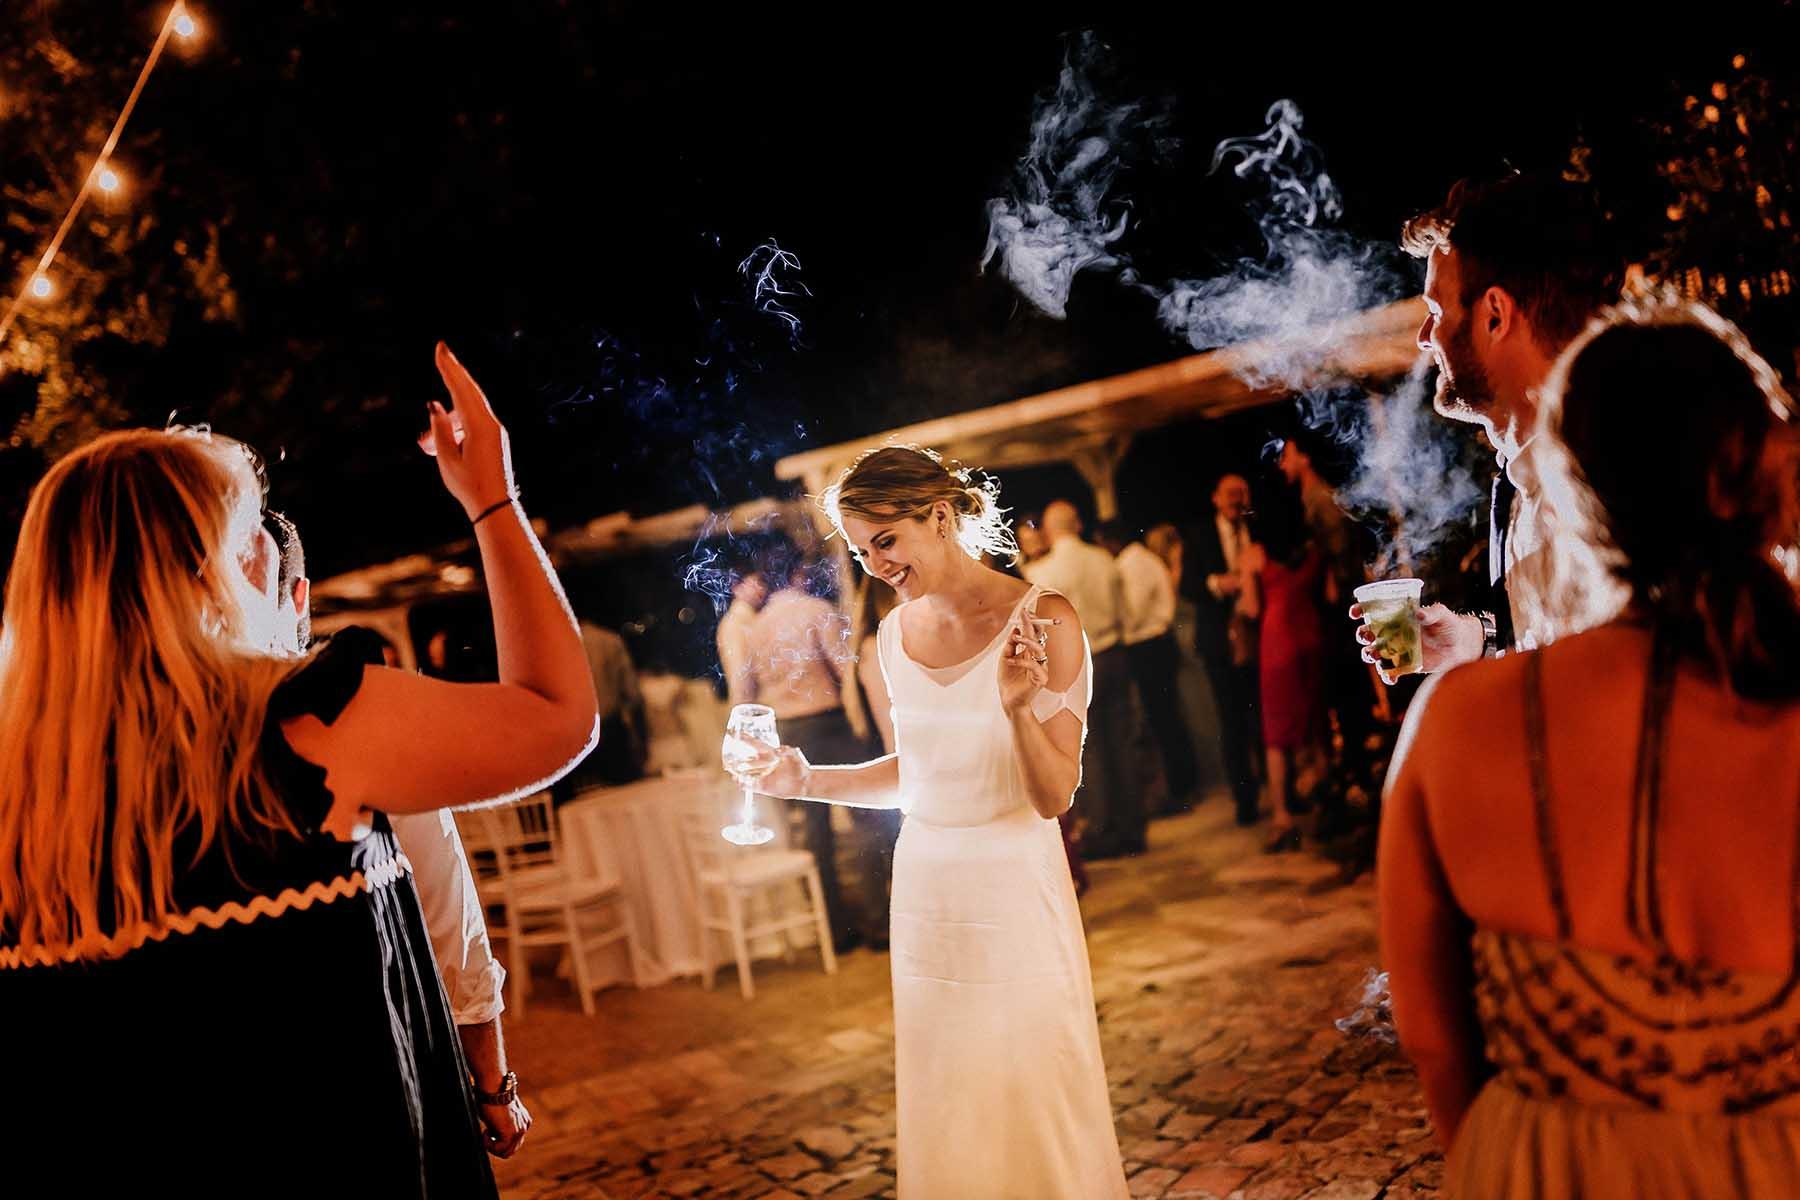 wedding rosciano castle italy 139.jpg